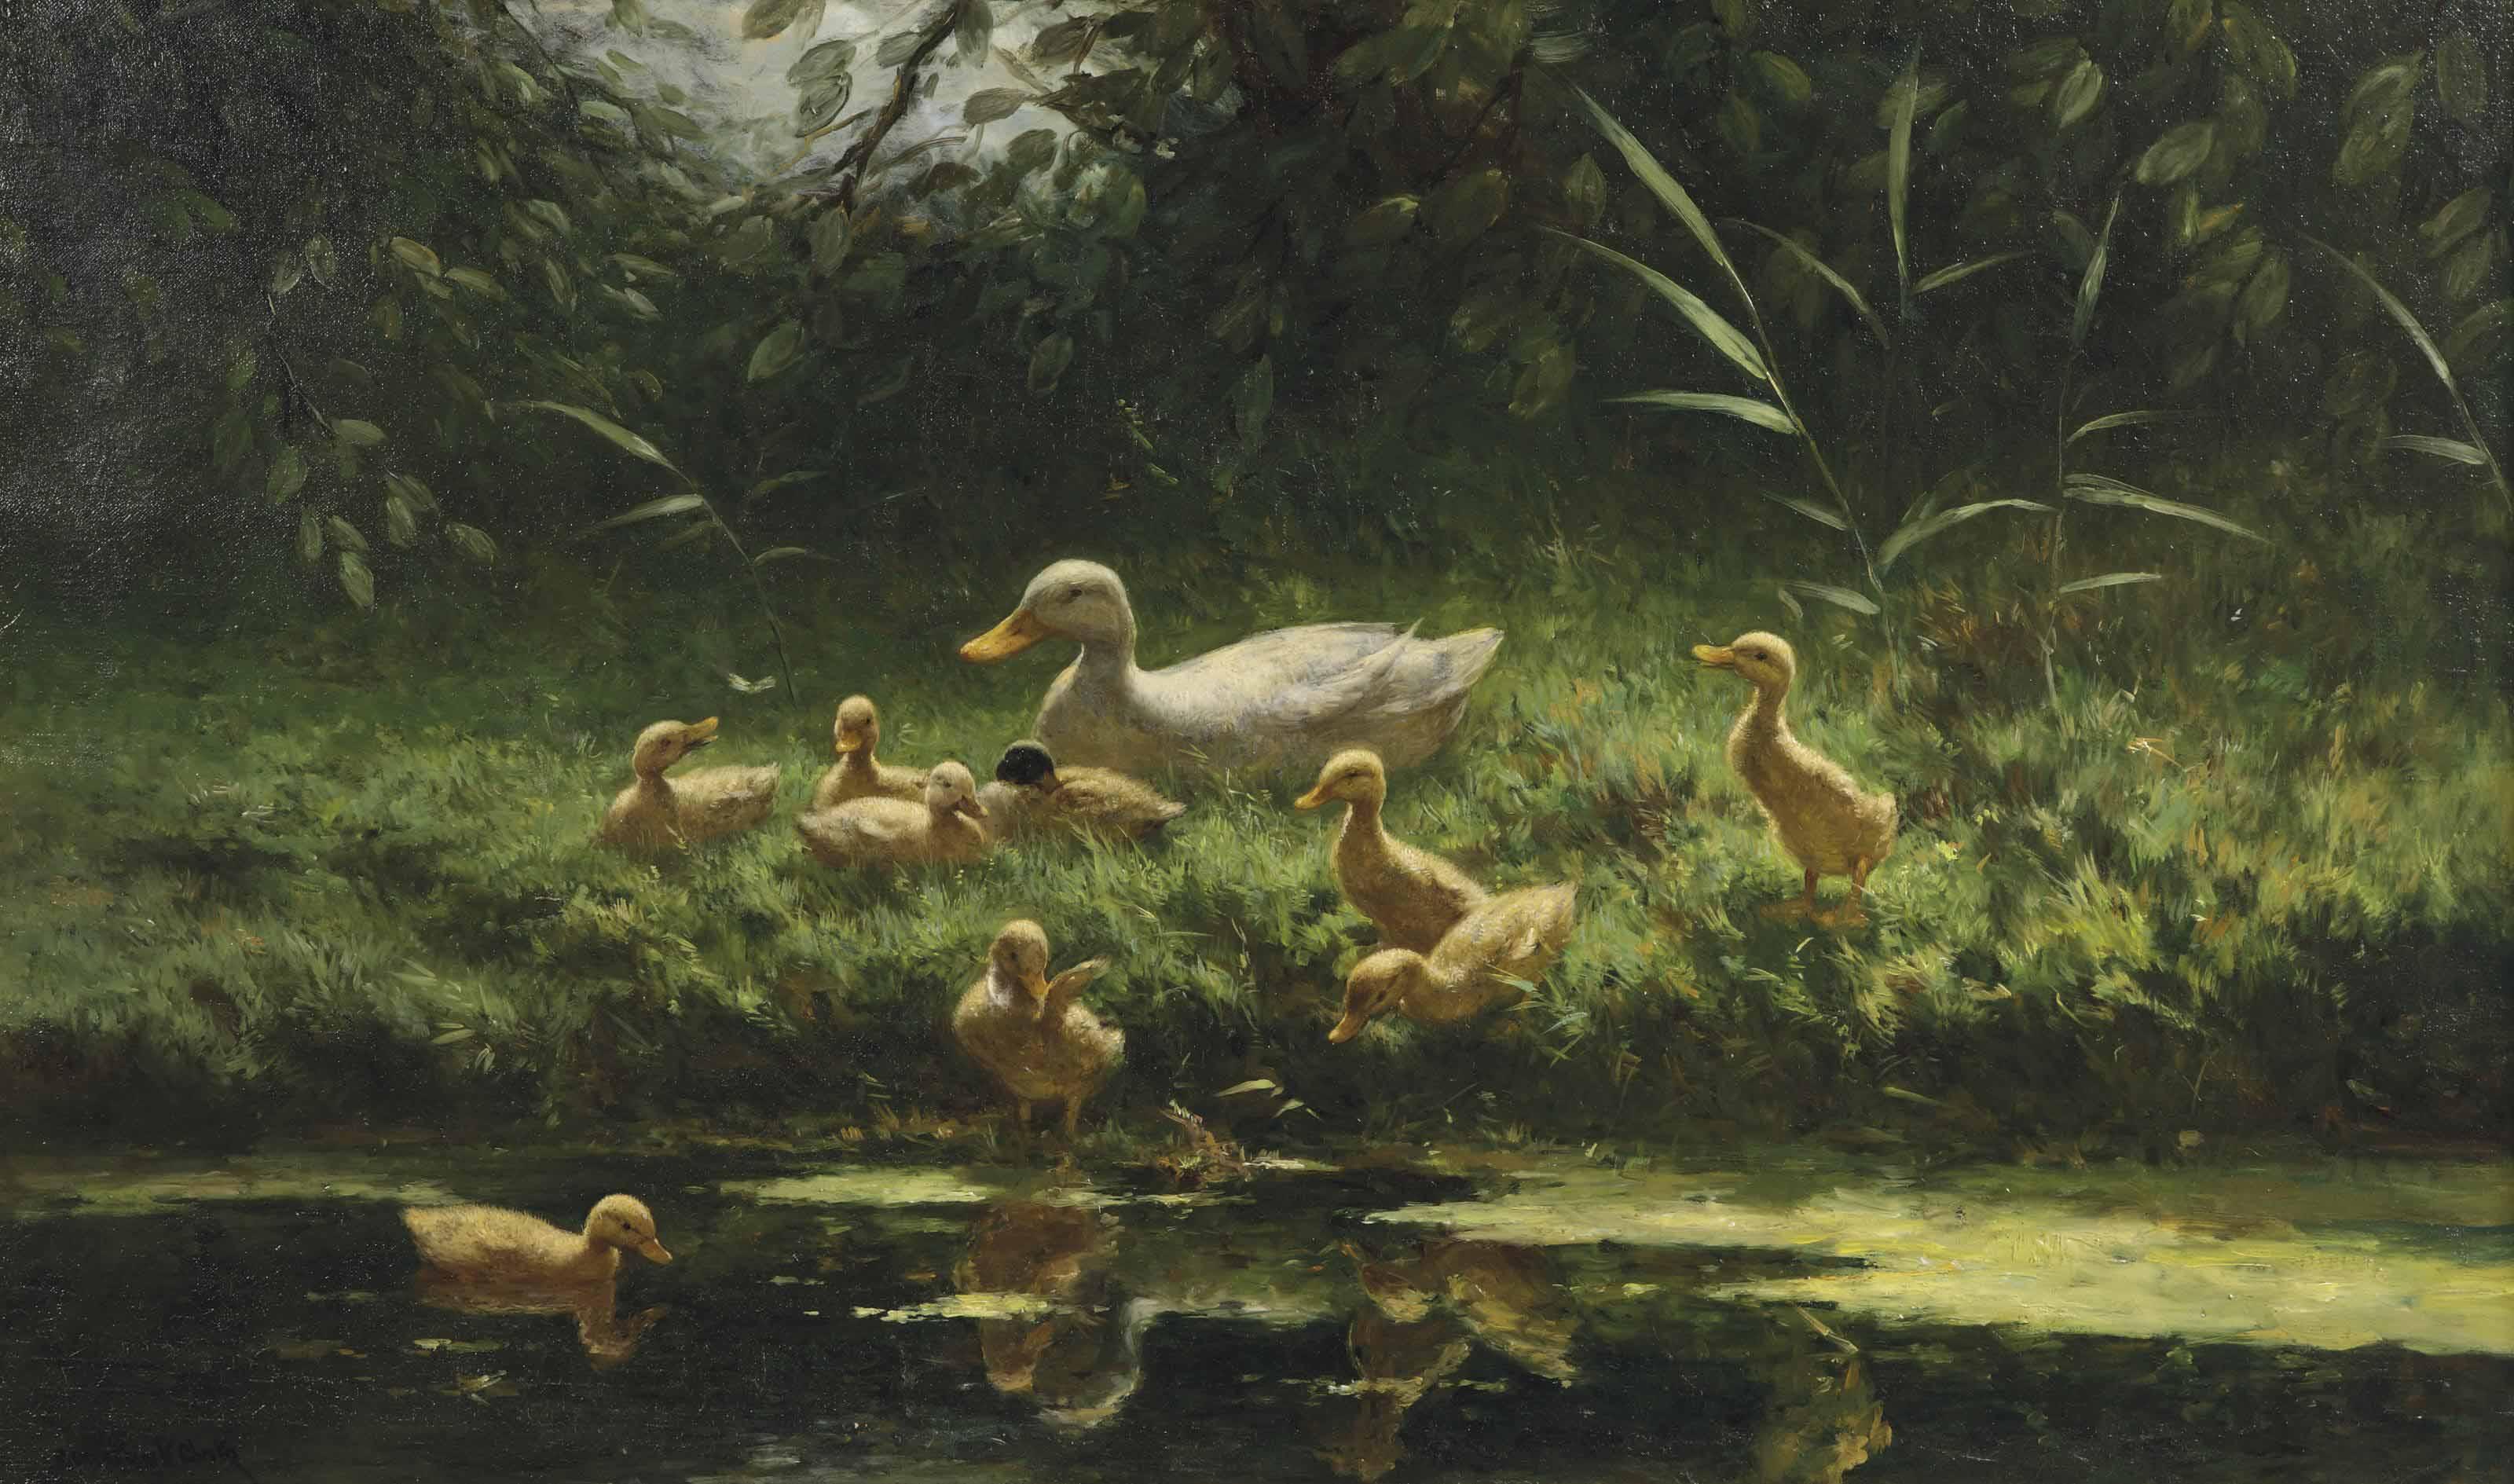 Ducklings on a sunlit riverbank